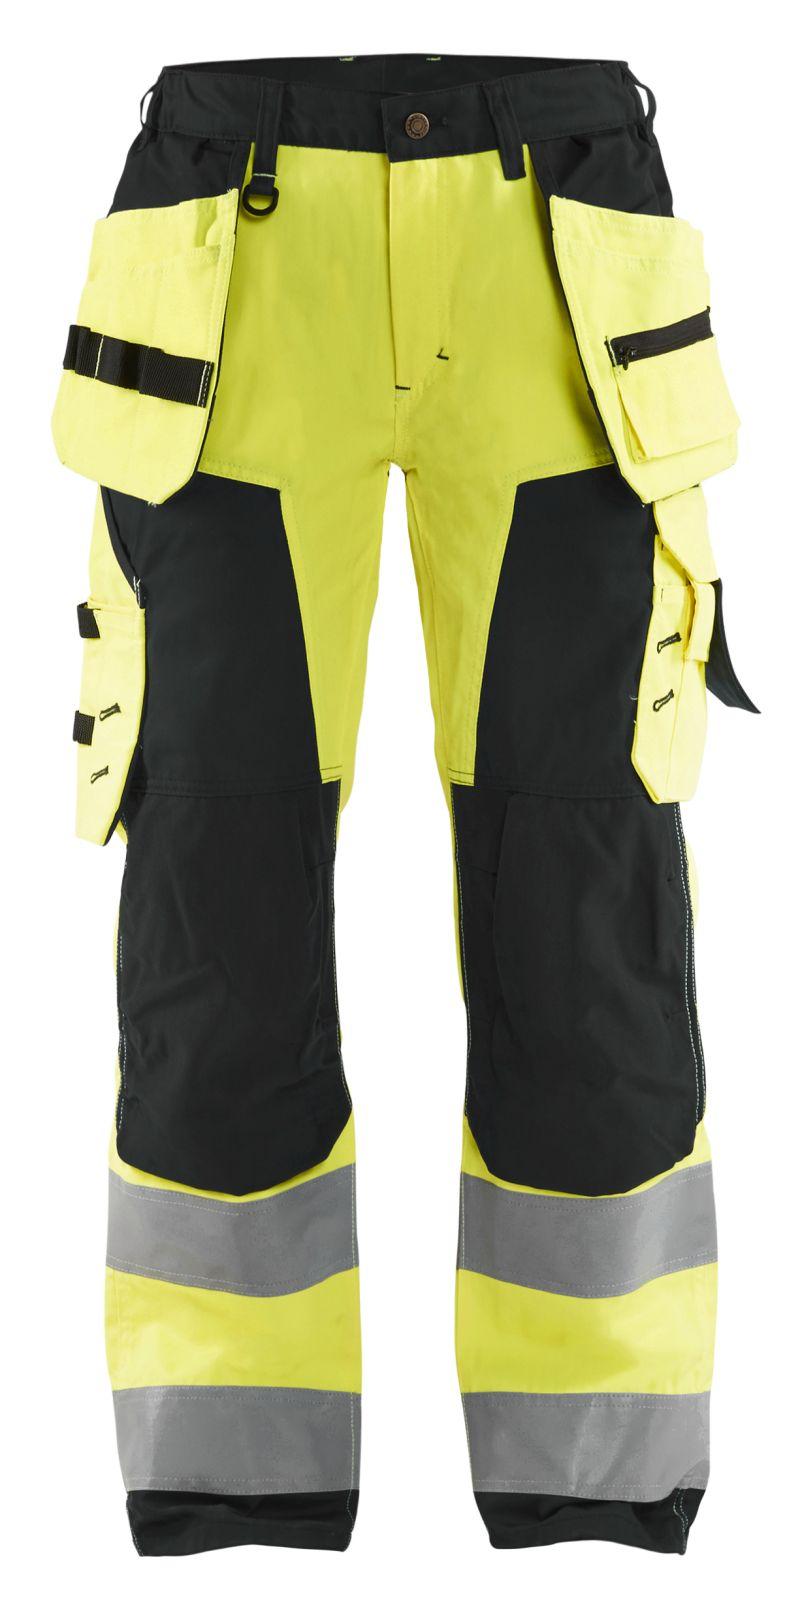 Blaklader Dames werkbroeken 71561811 High Vis geel-zwart(3399)